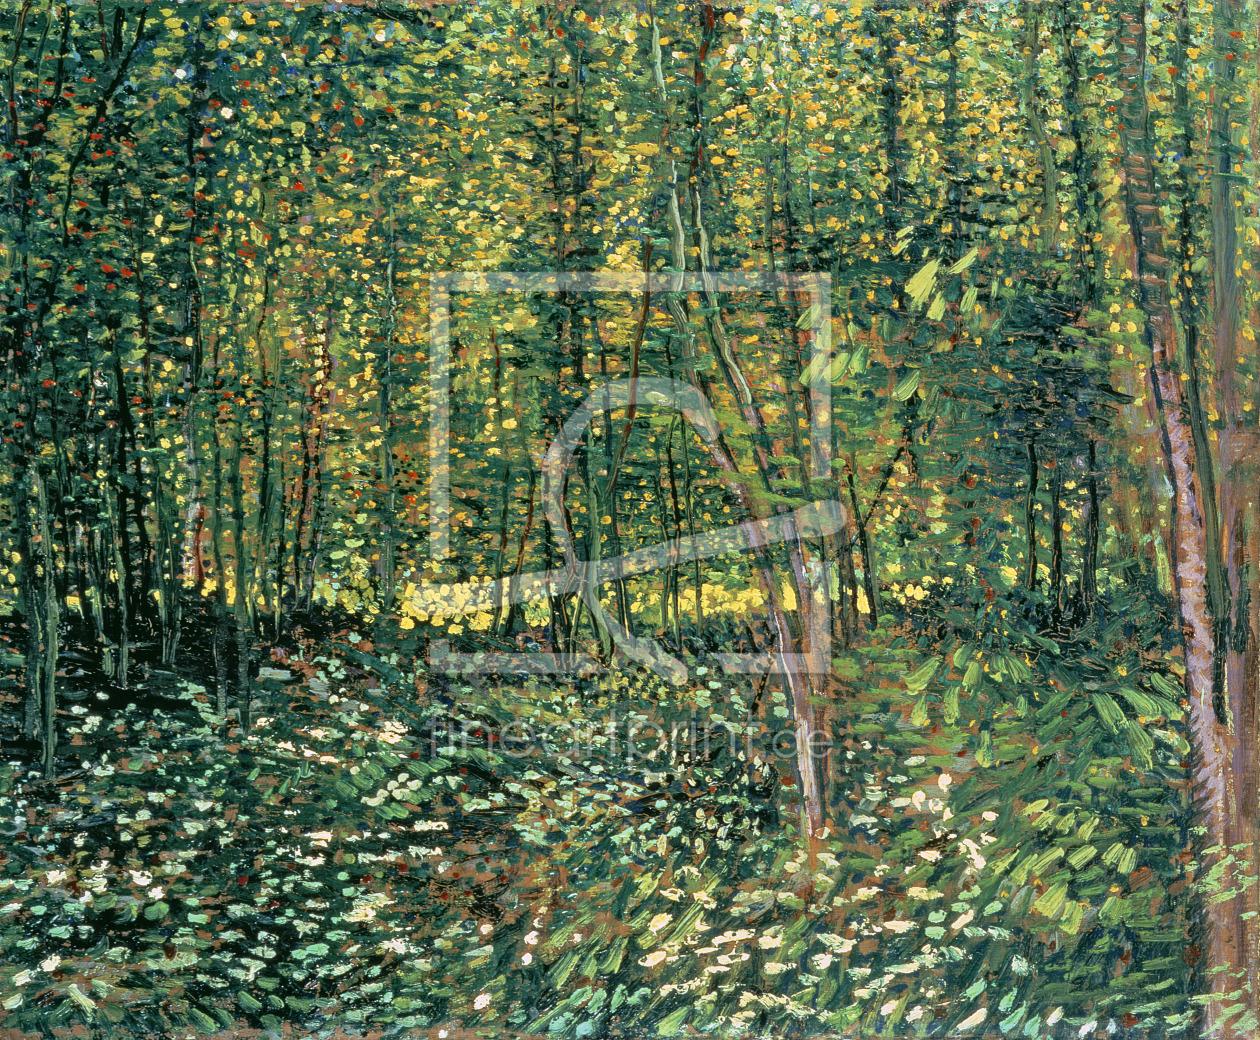 http://www.fineartprint.de/dynimage/bigpreview/0031000000/31001000/31001372.jpg